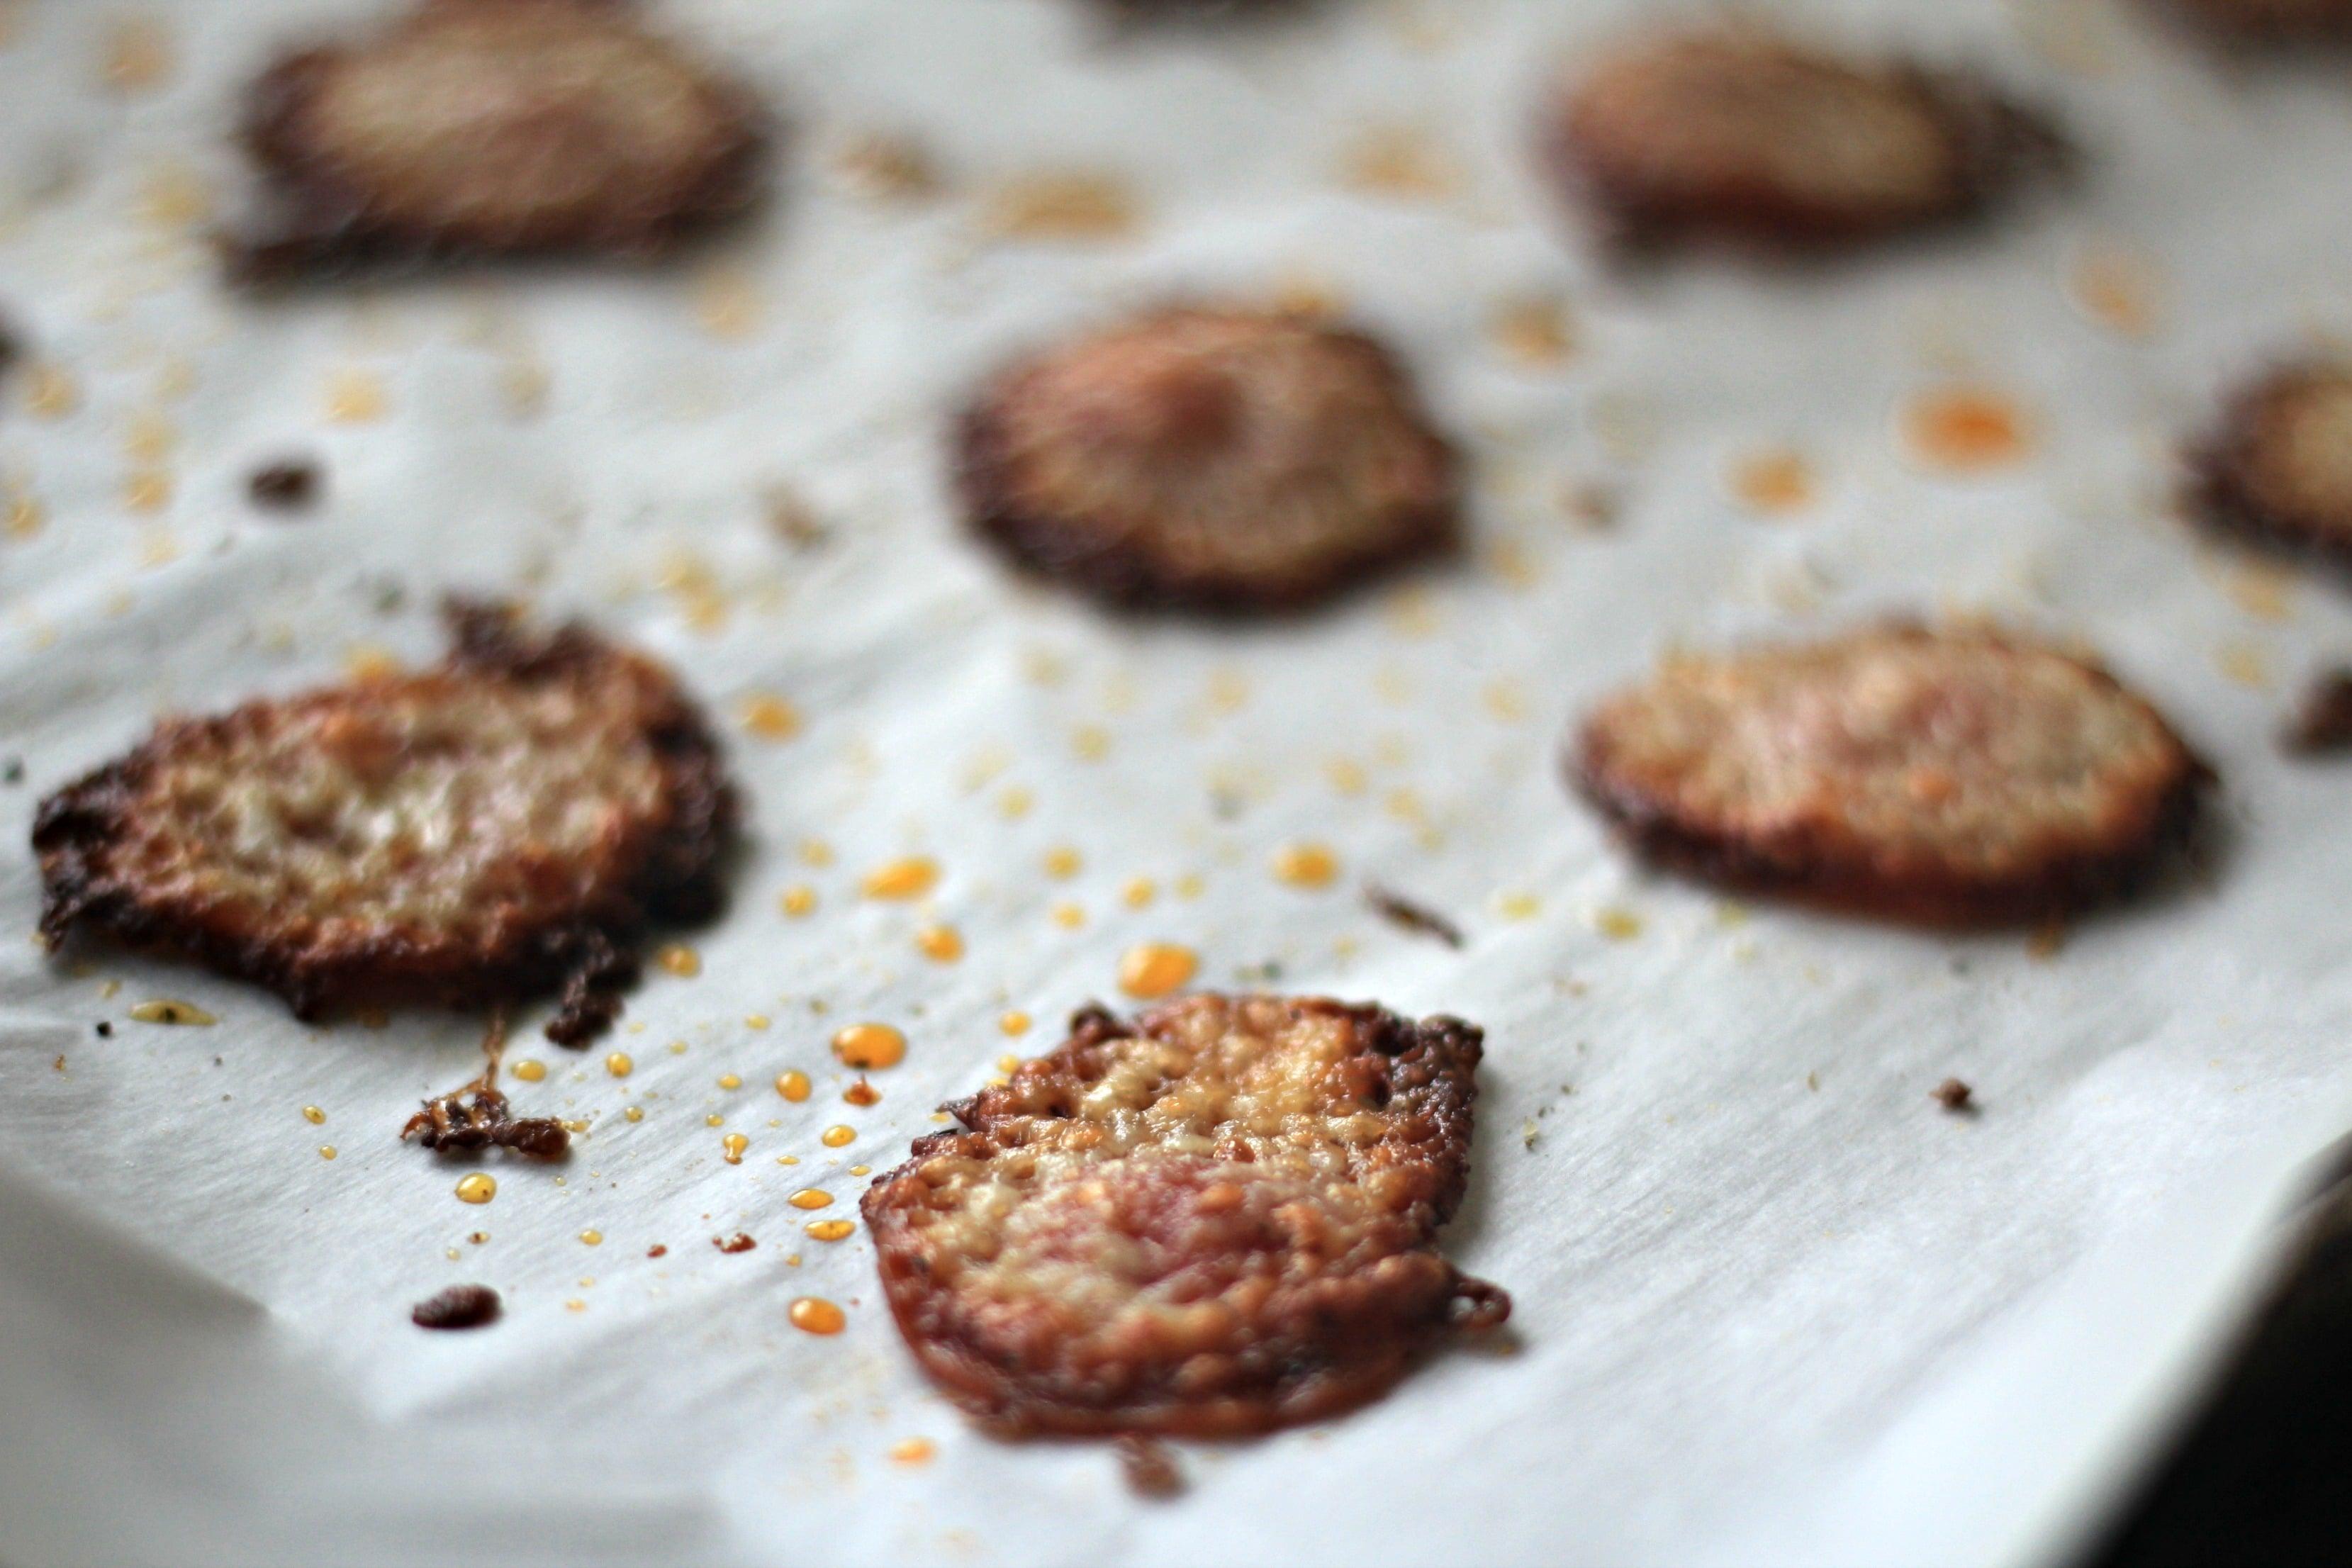 Keto Low Carb Snack Idea: Pepperoni Crisps Recipe